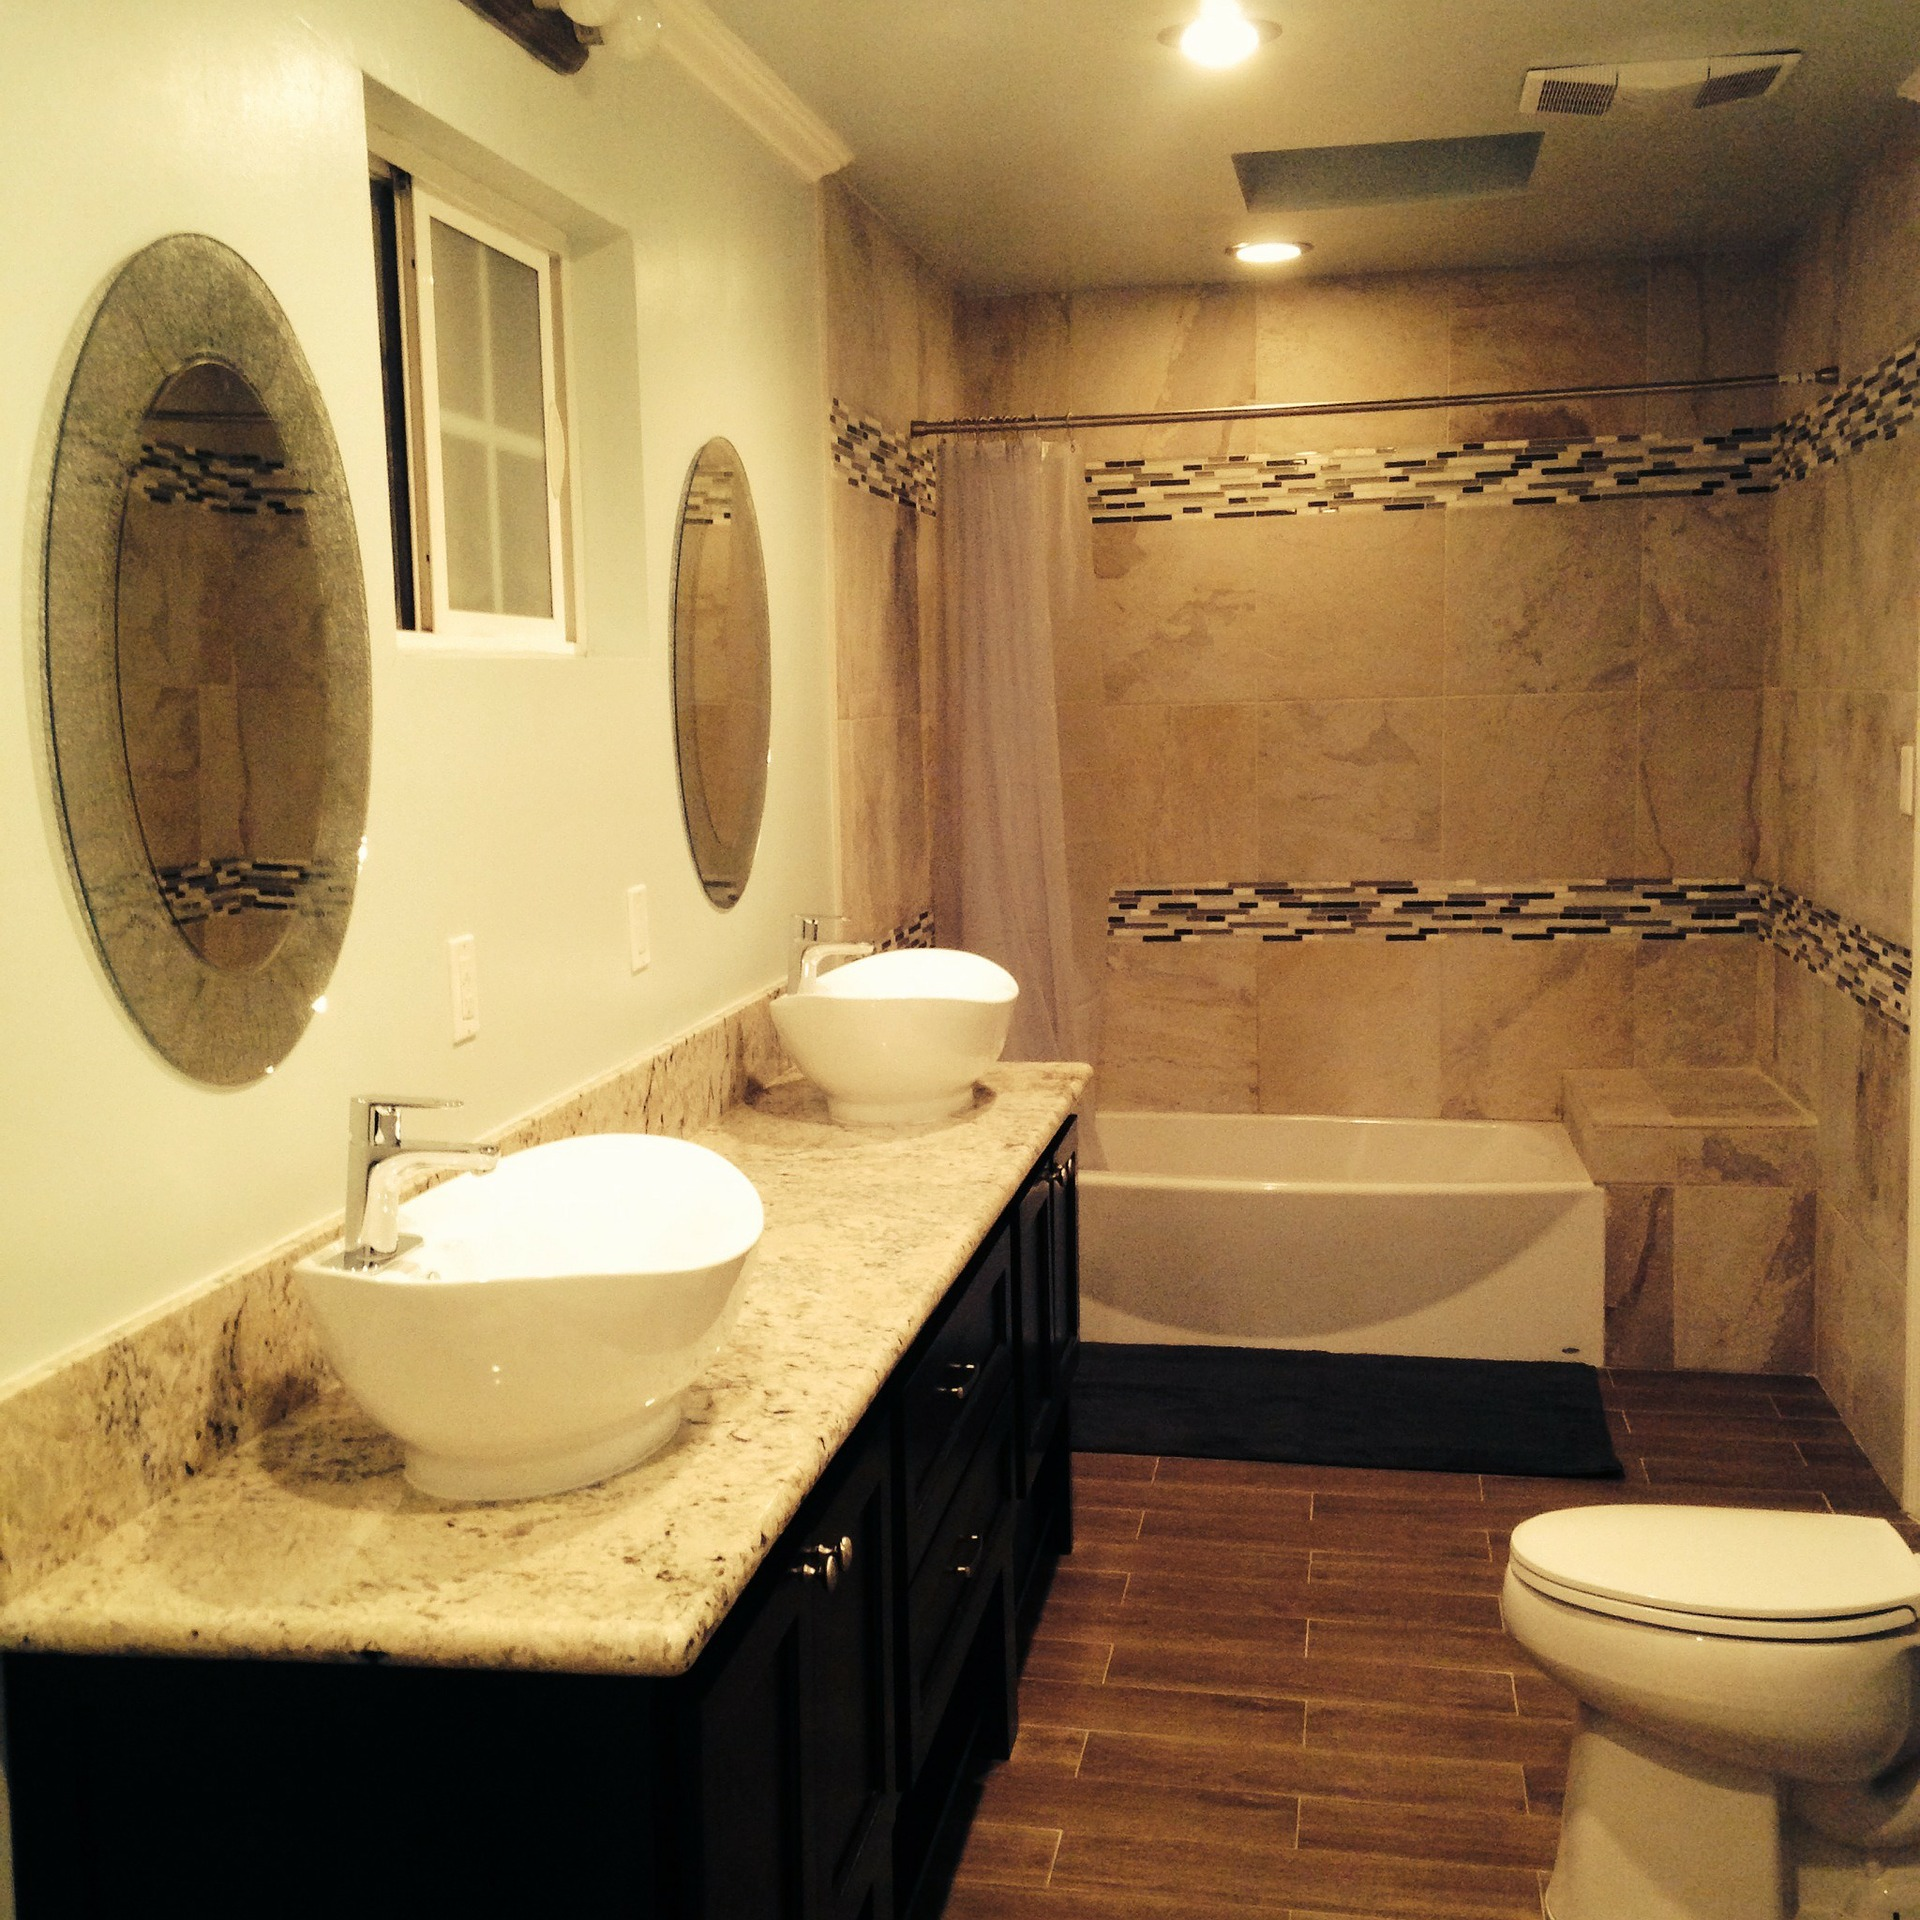 bowl-sink-bathroom-remodel-tile-accent-shower-wall.jpg